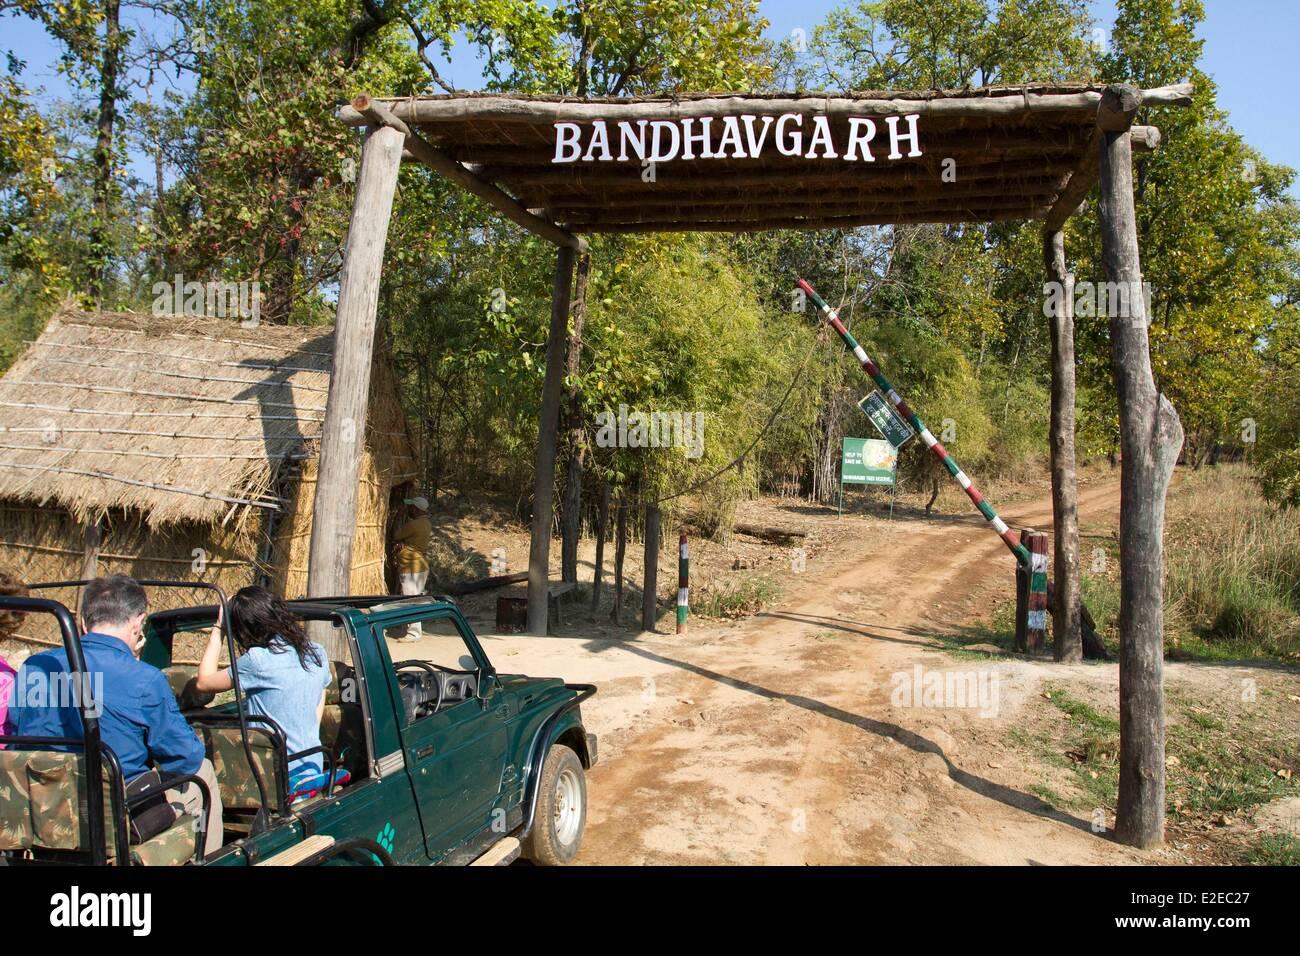 India, Madhya Pradesh state, Bandhavgarh National Park, entrance of the park - Stock Image